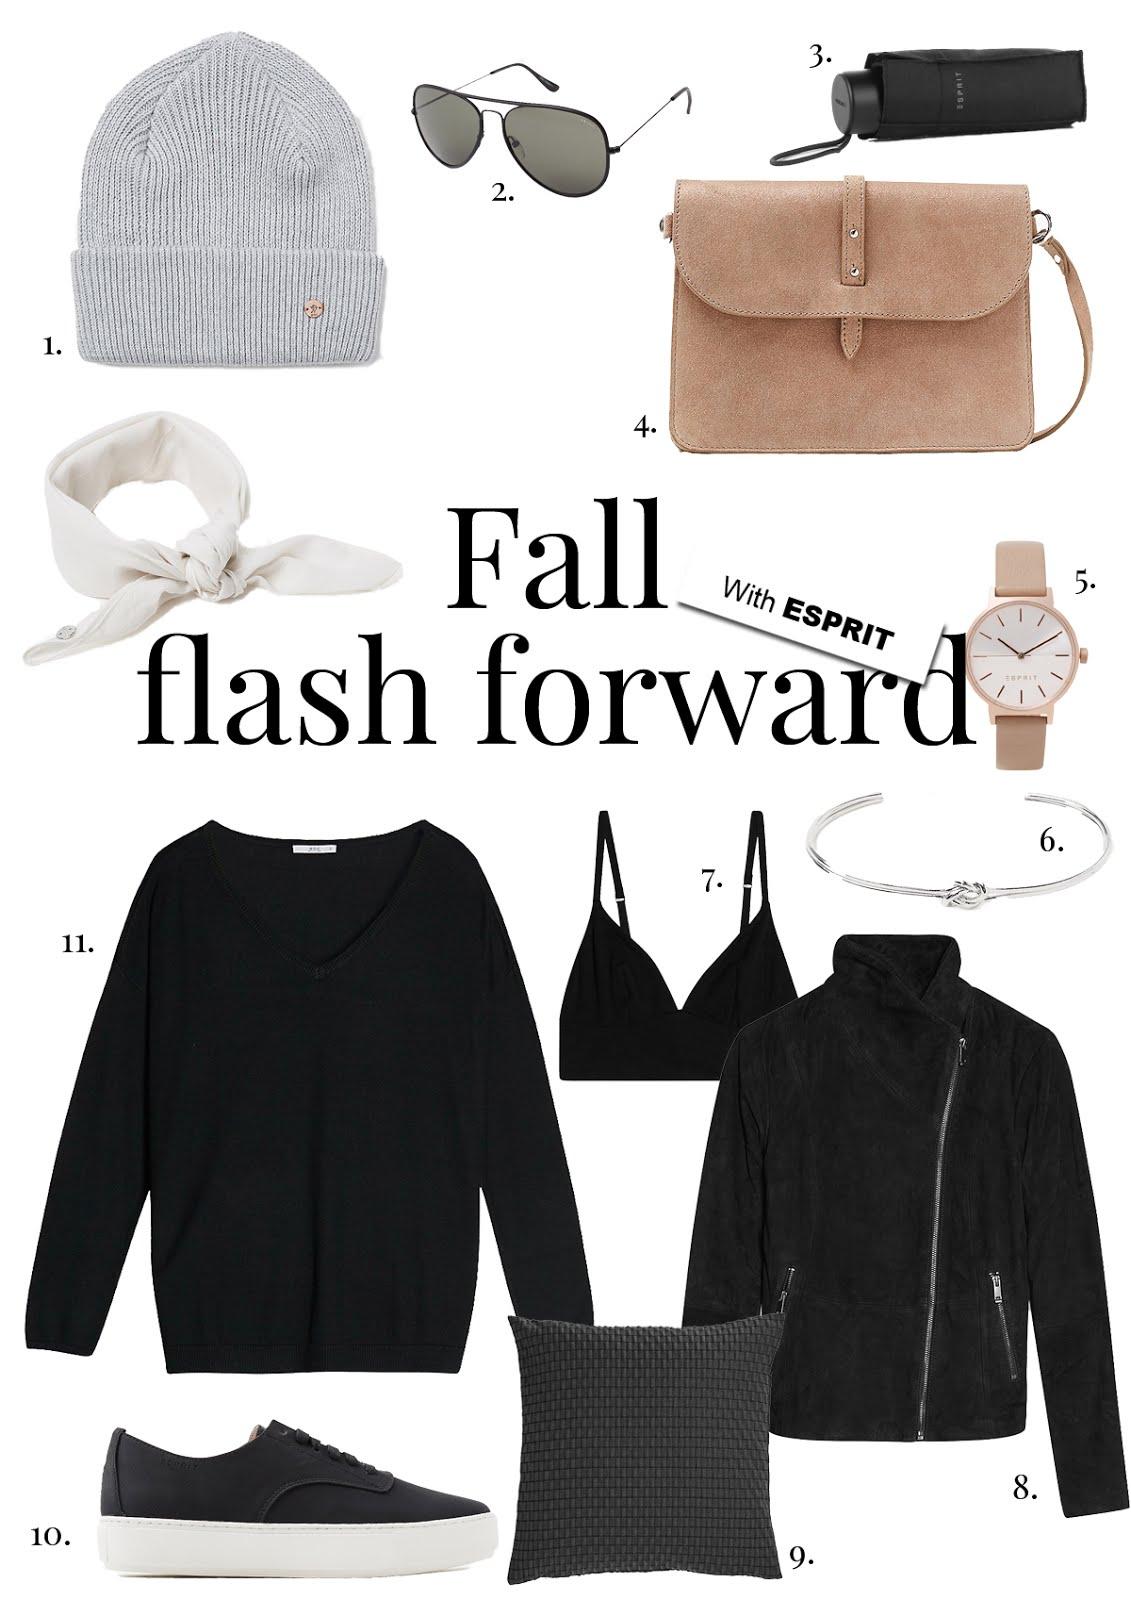 Esprit, shopping, fall 17, FW18, inspiration, knitwear, cosy, shearling jacket, aviator sunglasses, pocket umbrella